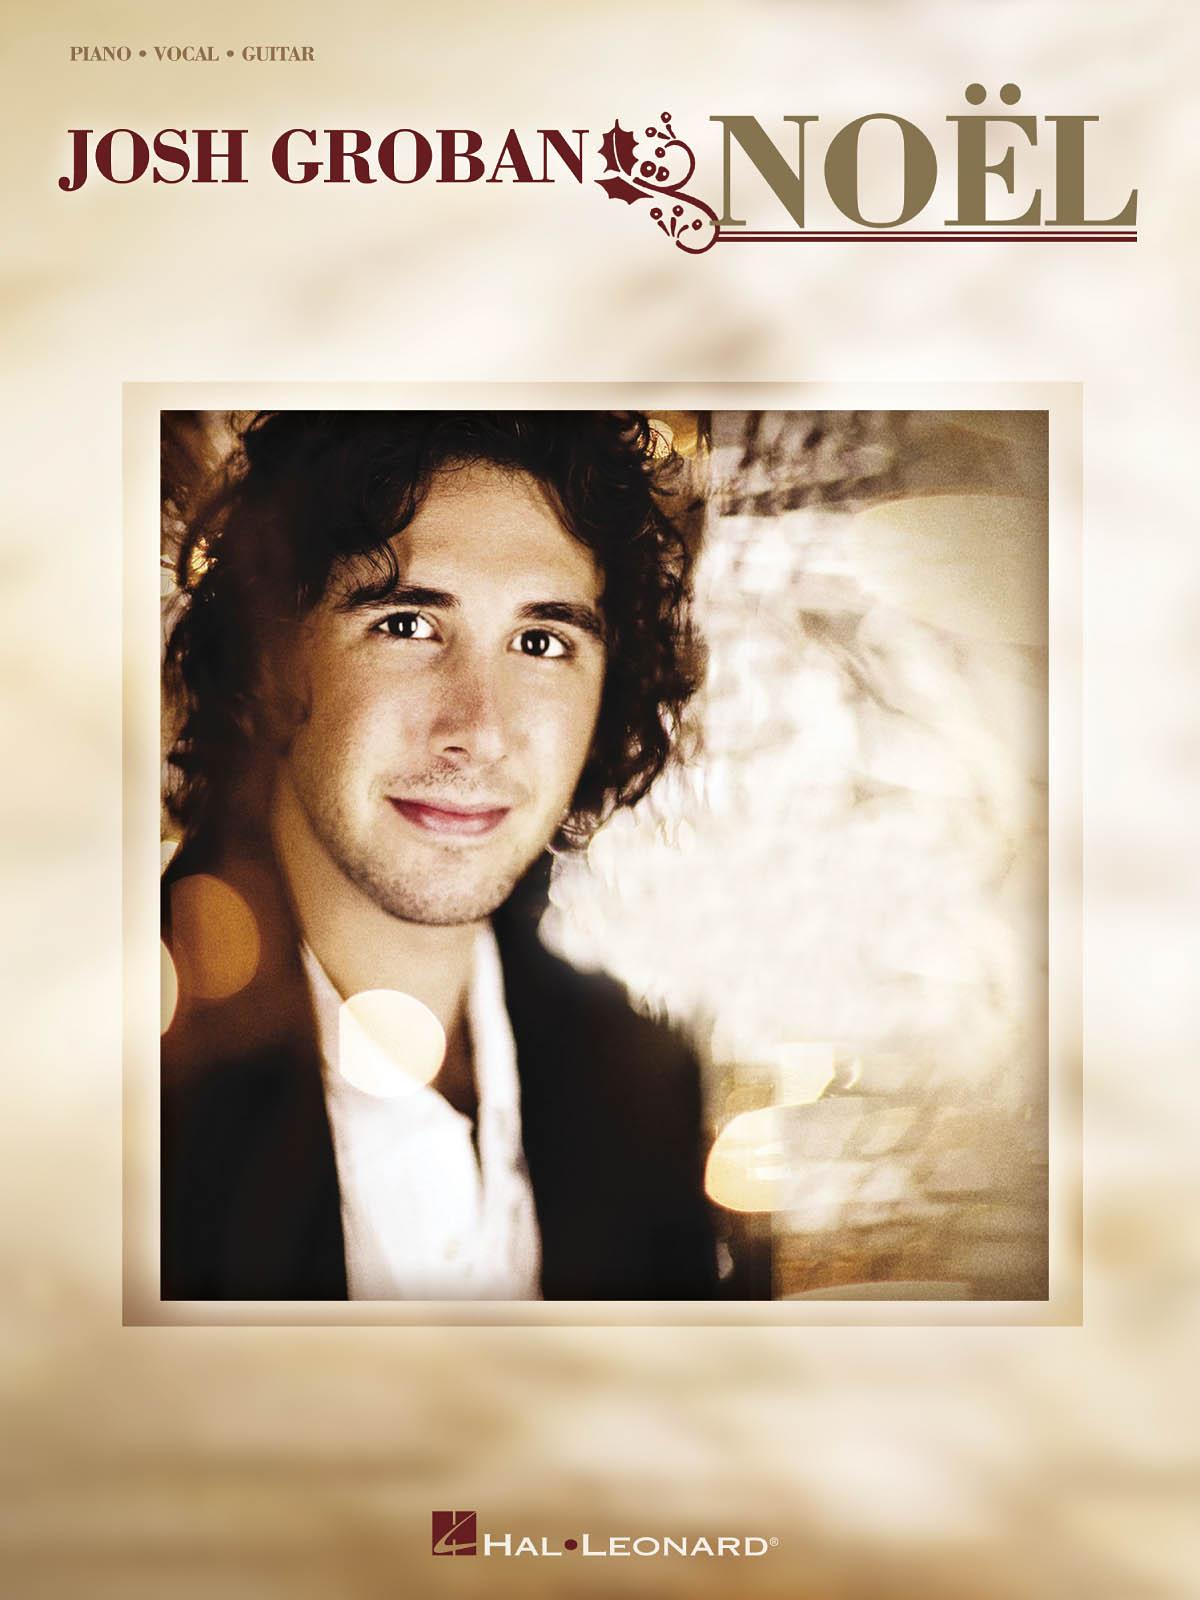 Josh Groban: Josh Groban - Noel: Piano  Vocal and Guitar: Album Songbook